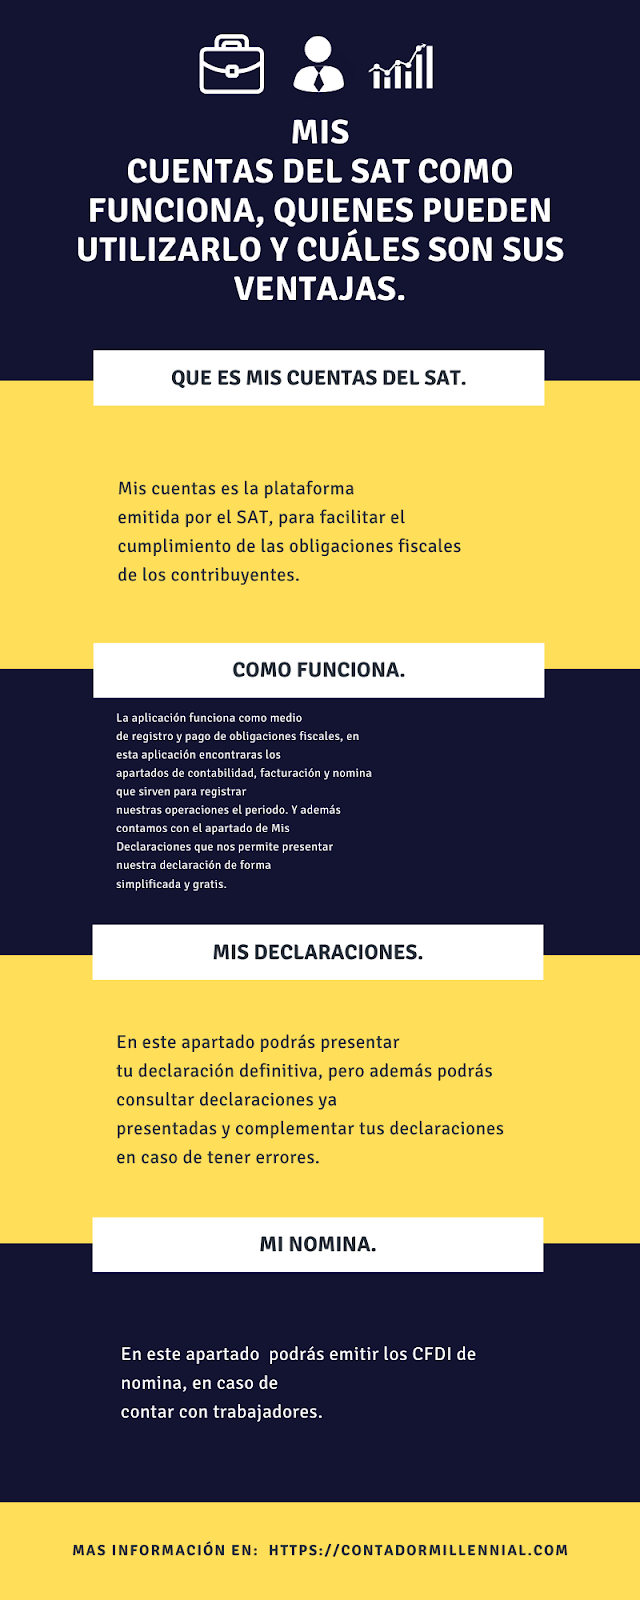 Infografia sobre mis cuentas de la SAT - Contador Millennial